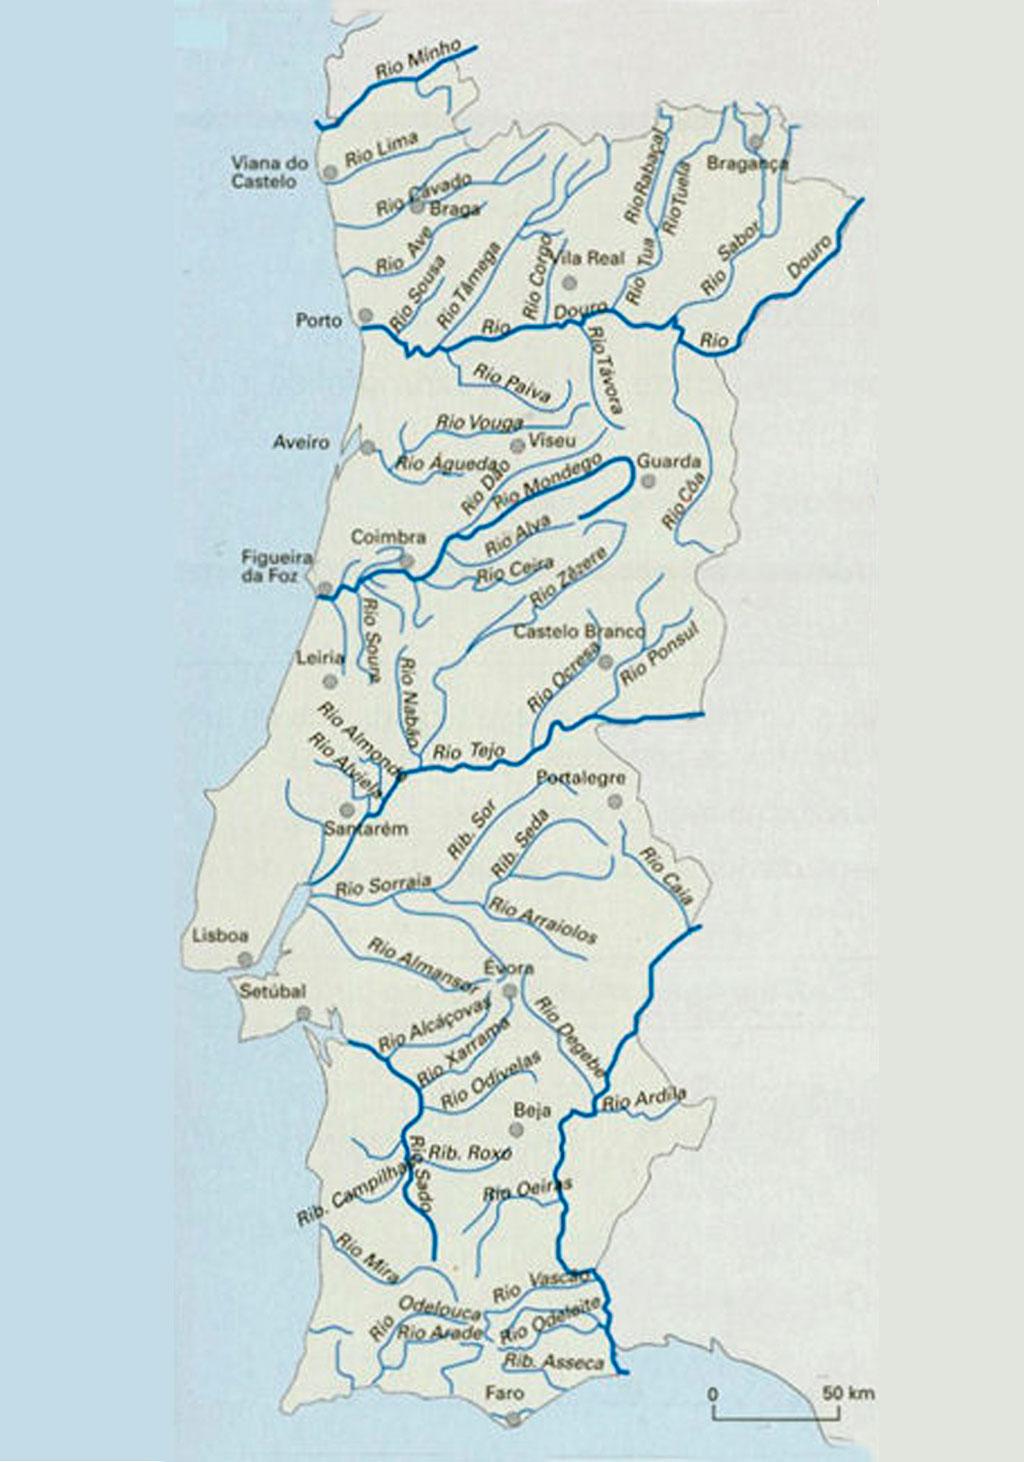 mapa de rios portugal Maps   Portugal B'side mapa de rios portugal